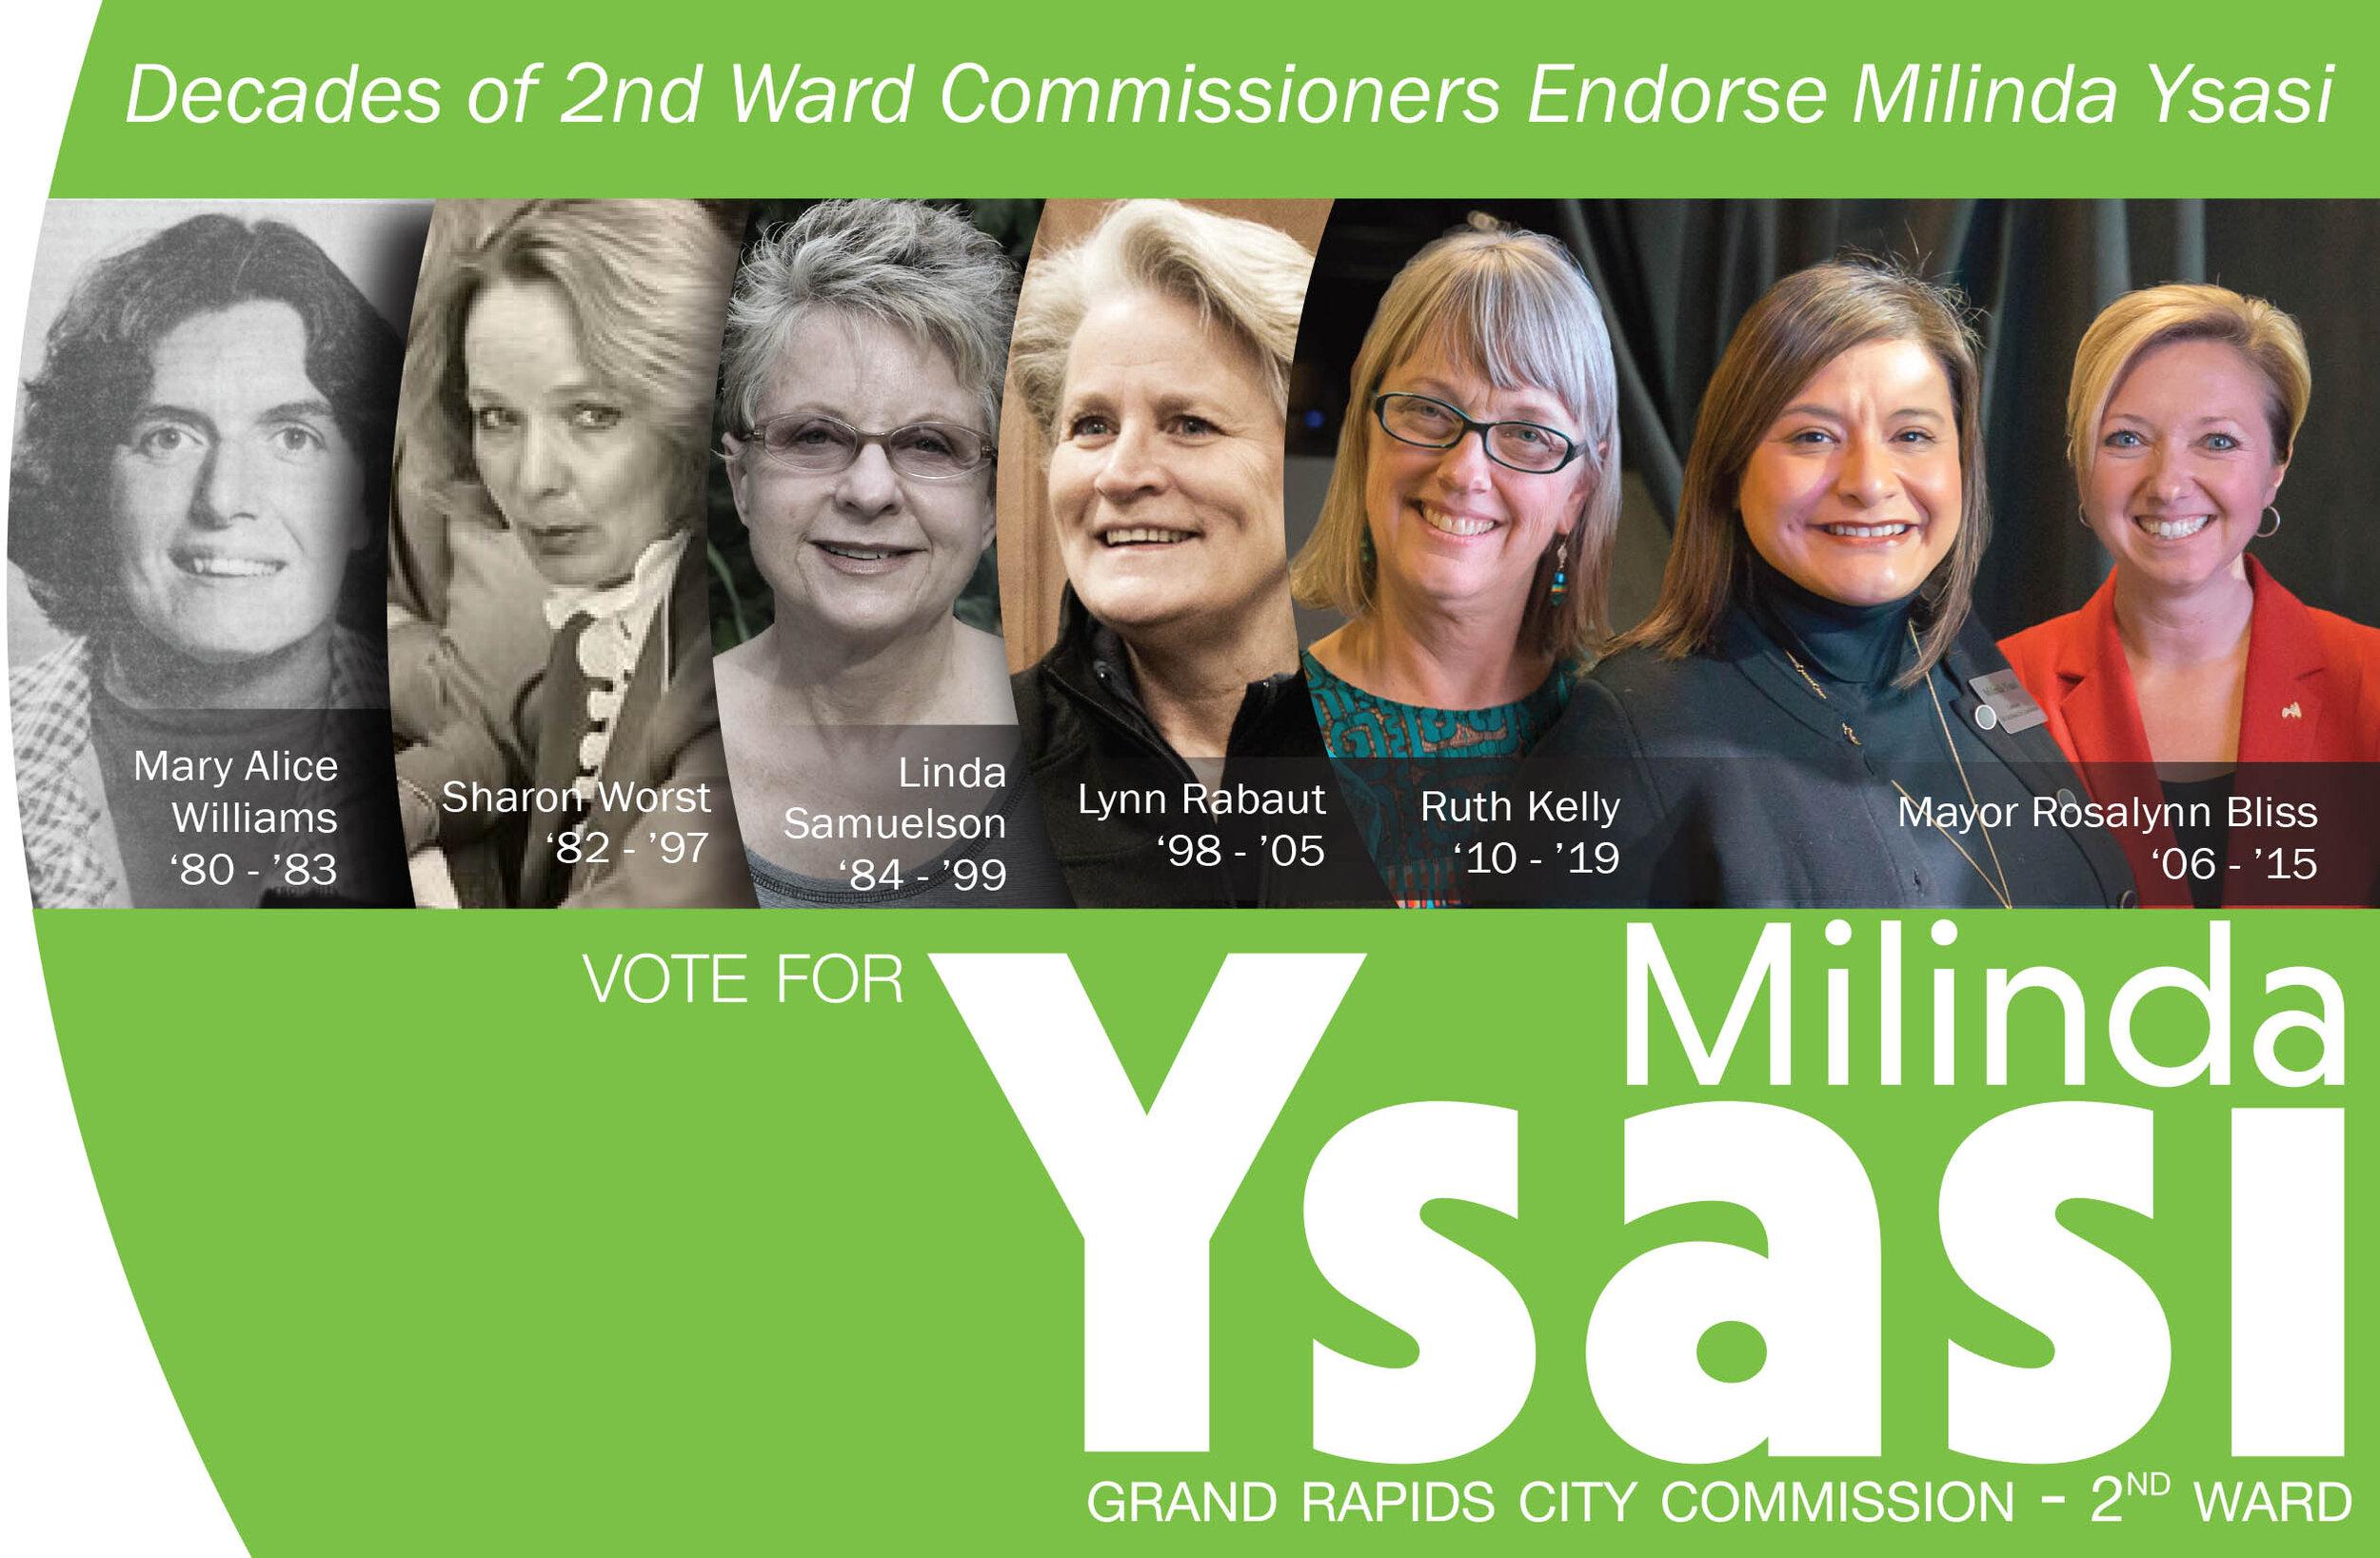 ysasi_general_decades_of_commissioners.jpg